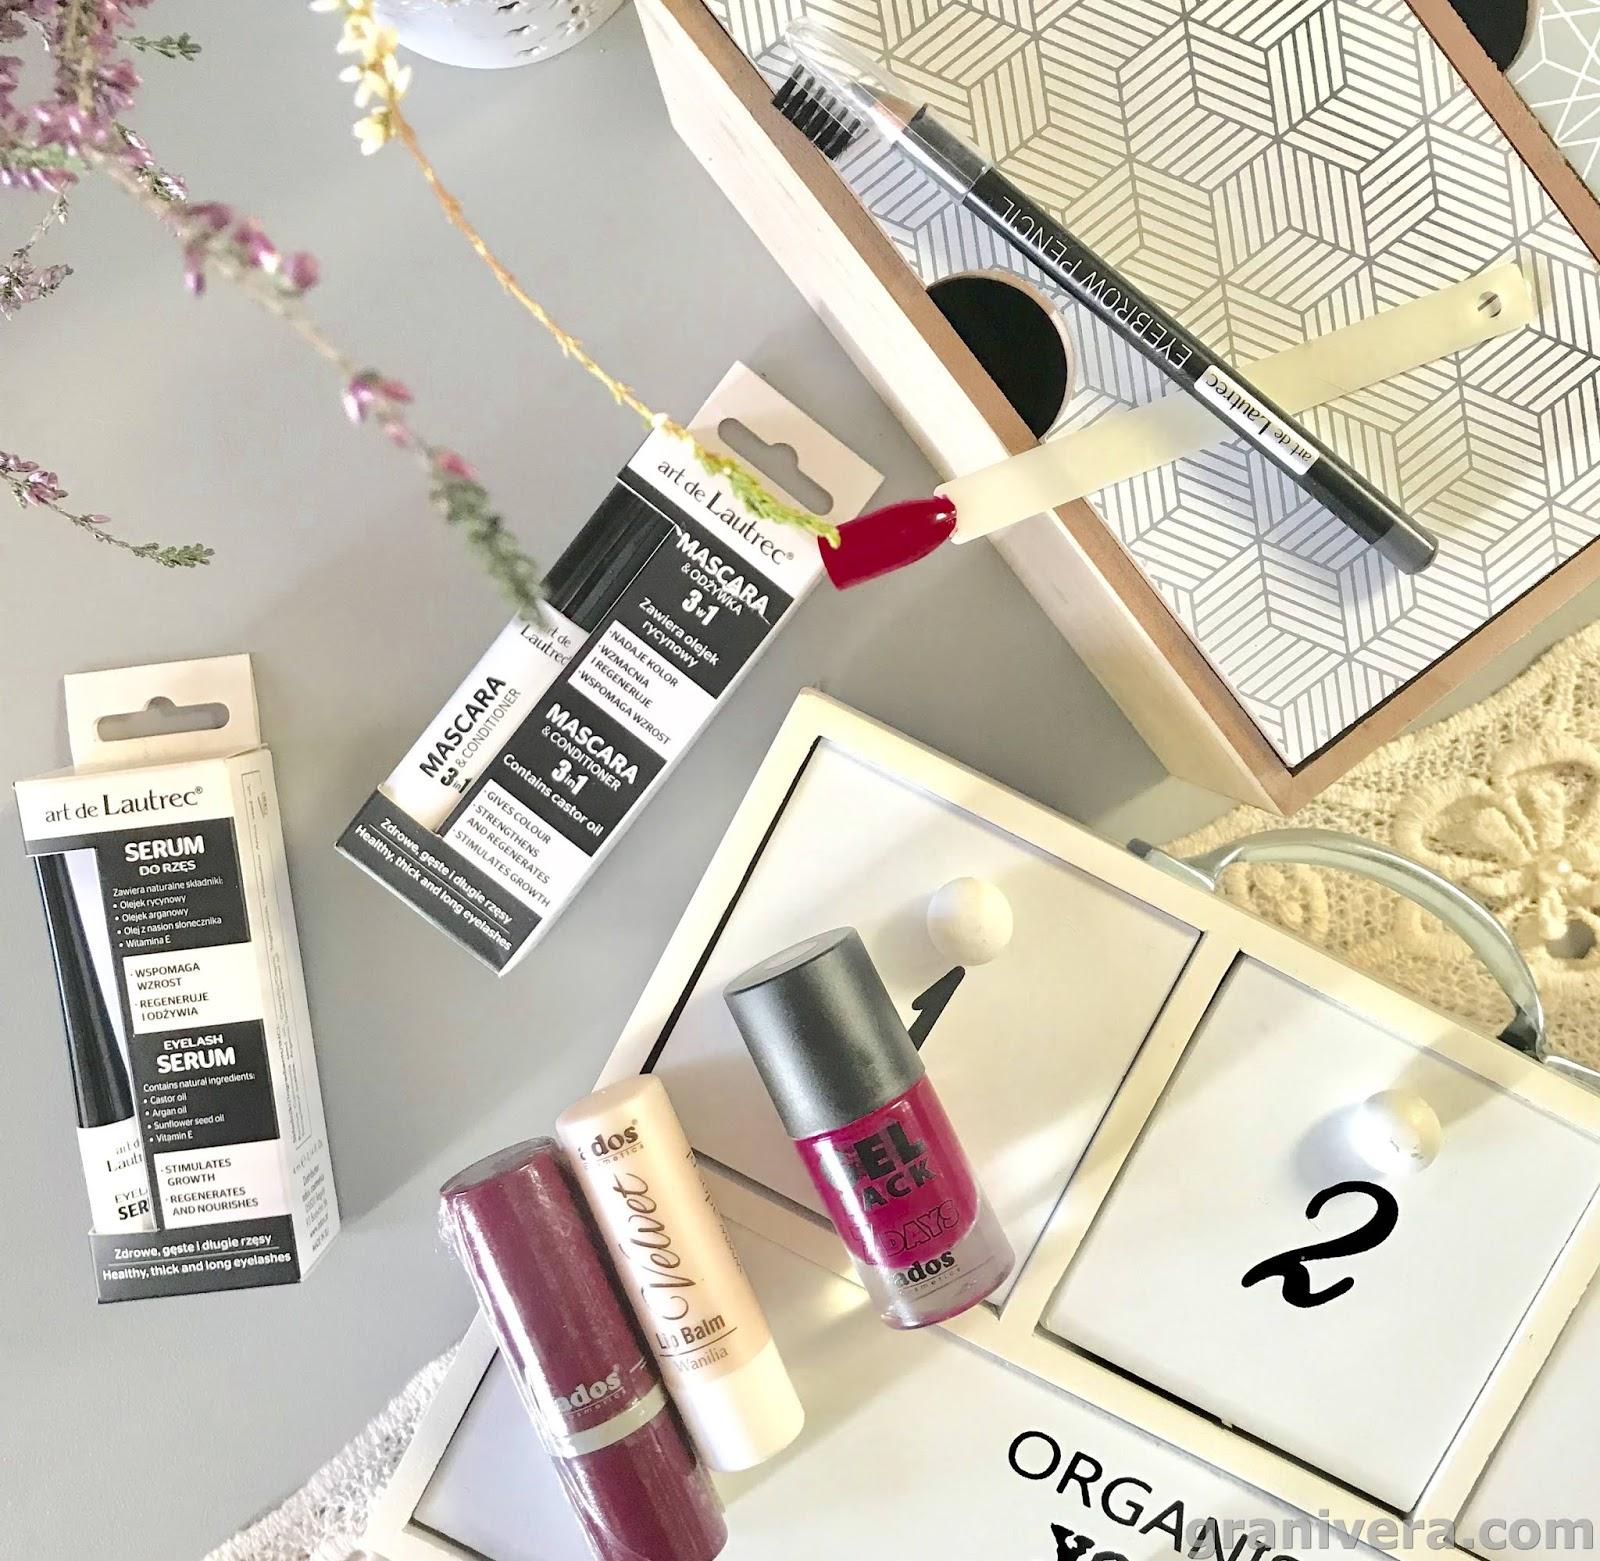 Kilka słów o produktach marki  Ados i Art de Lautrec / mascara, serum, pomadki i kredka do brwi